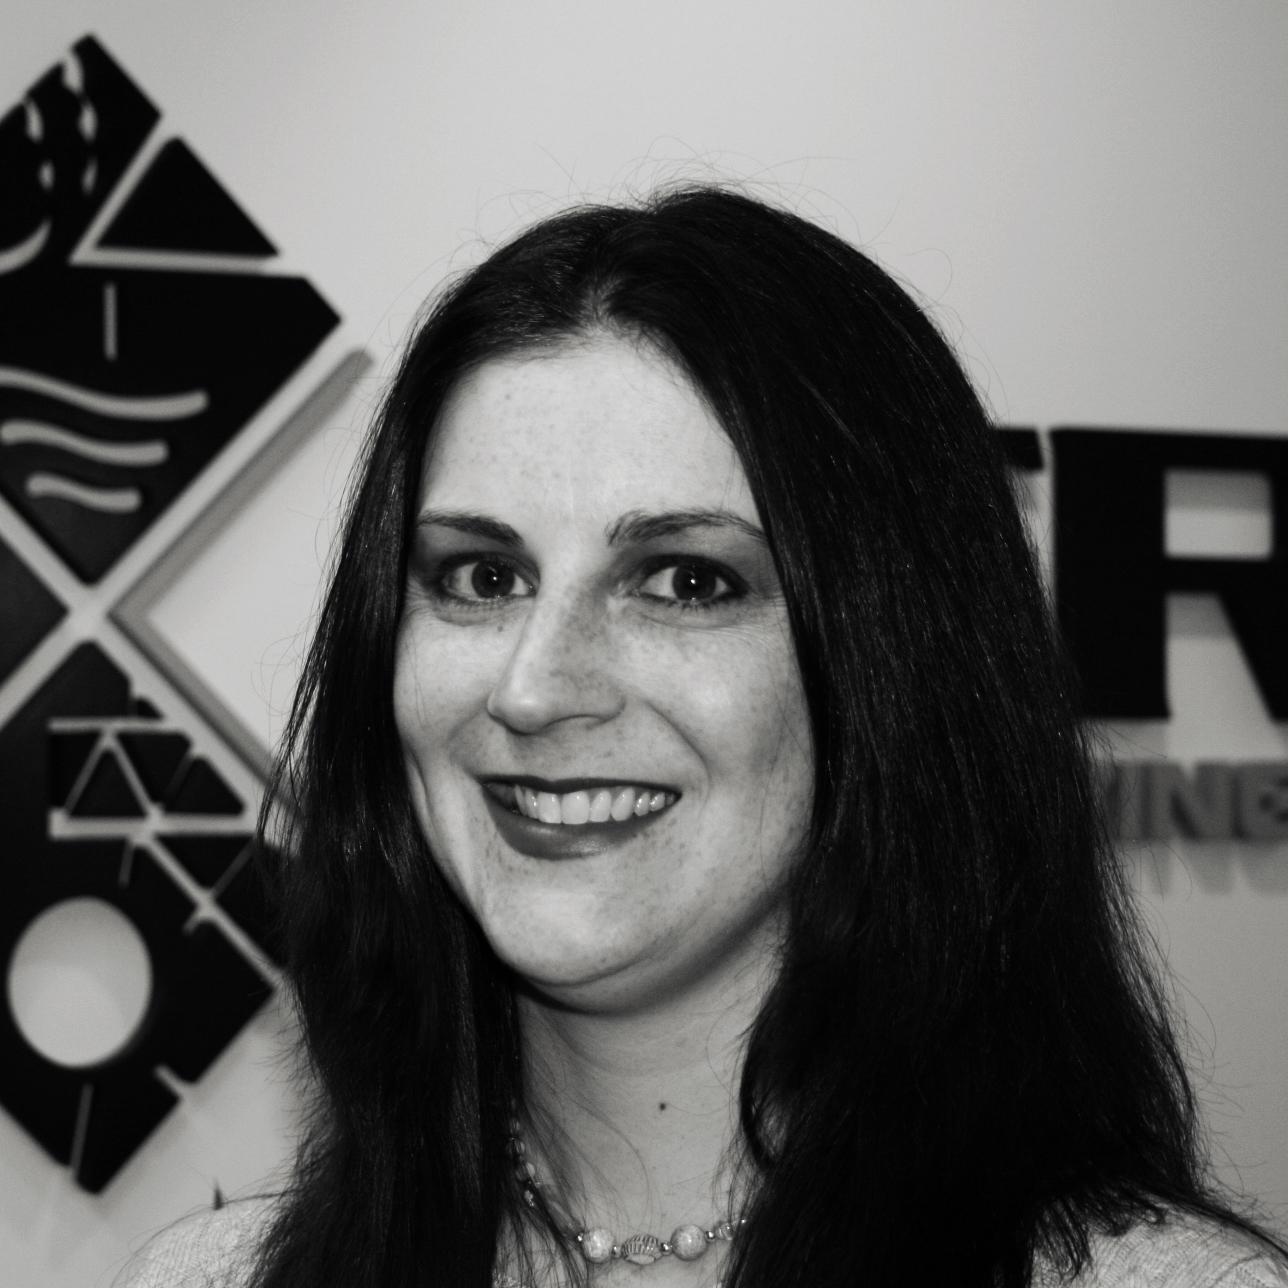 Julianne K. Dannhauser